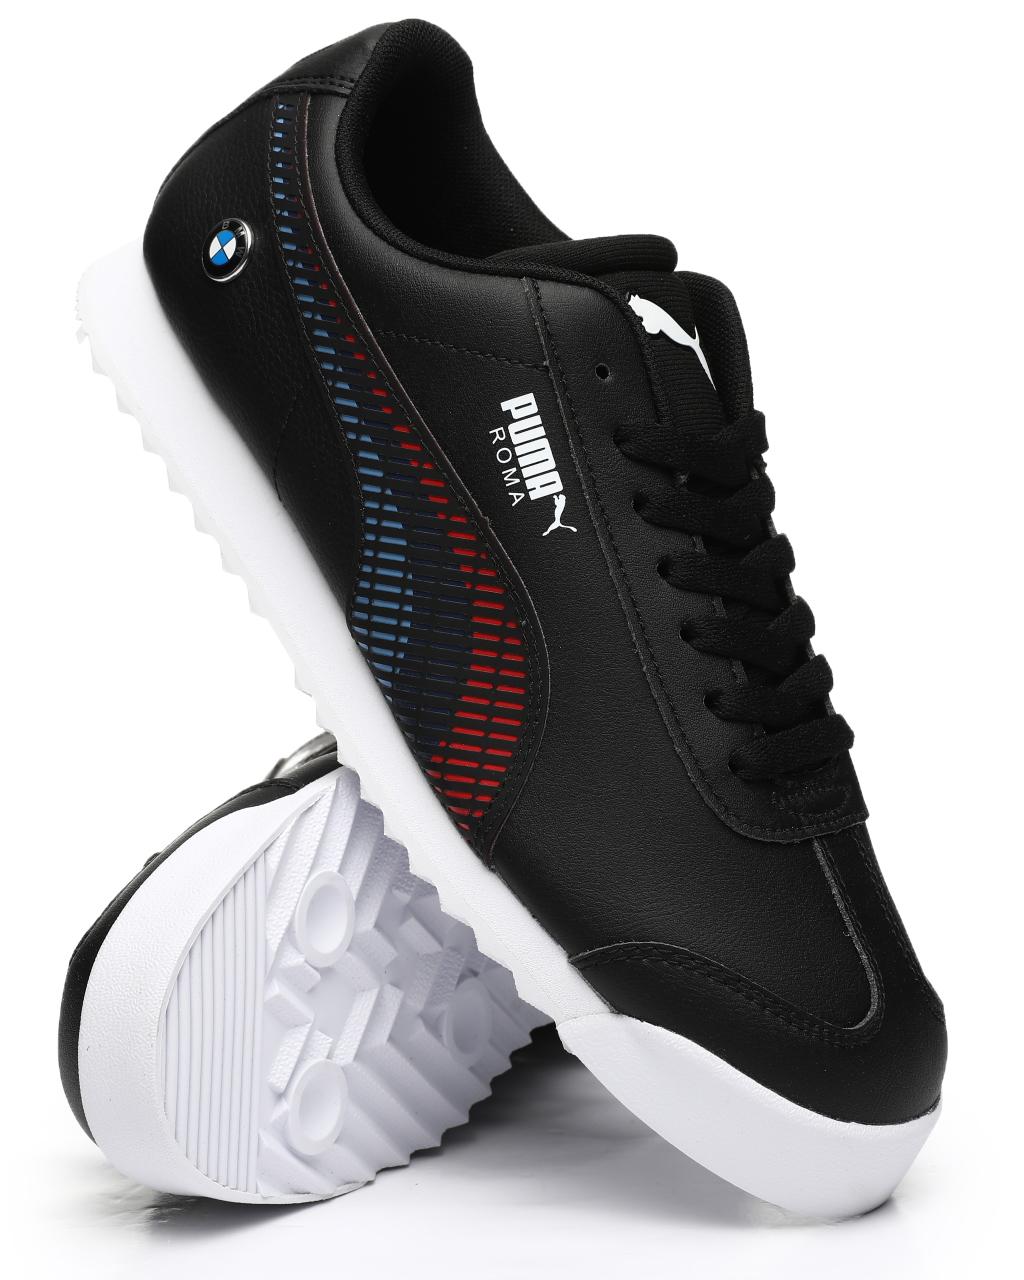 Buy BMW M Motorsport Roma Sneakers Men's Footwear from Puma ...